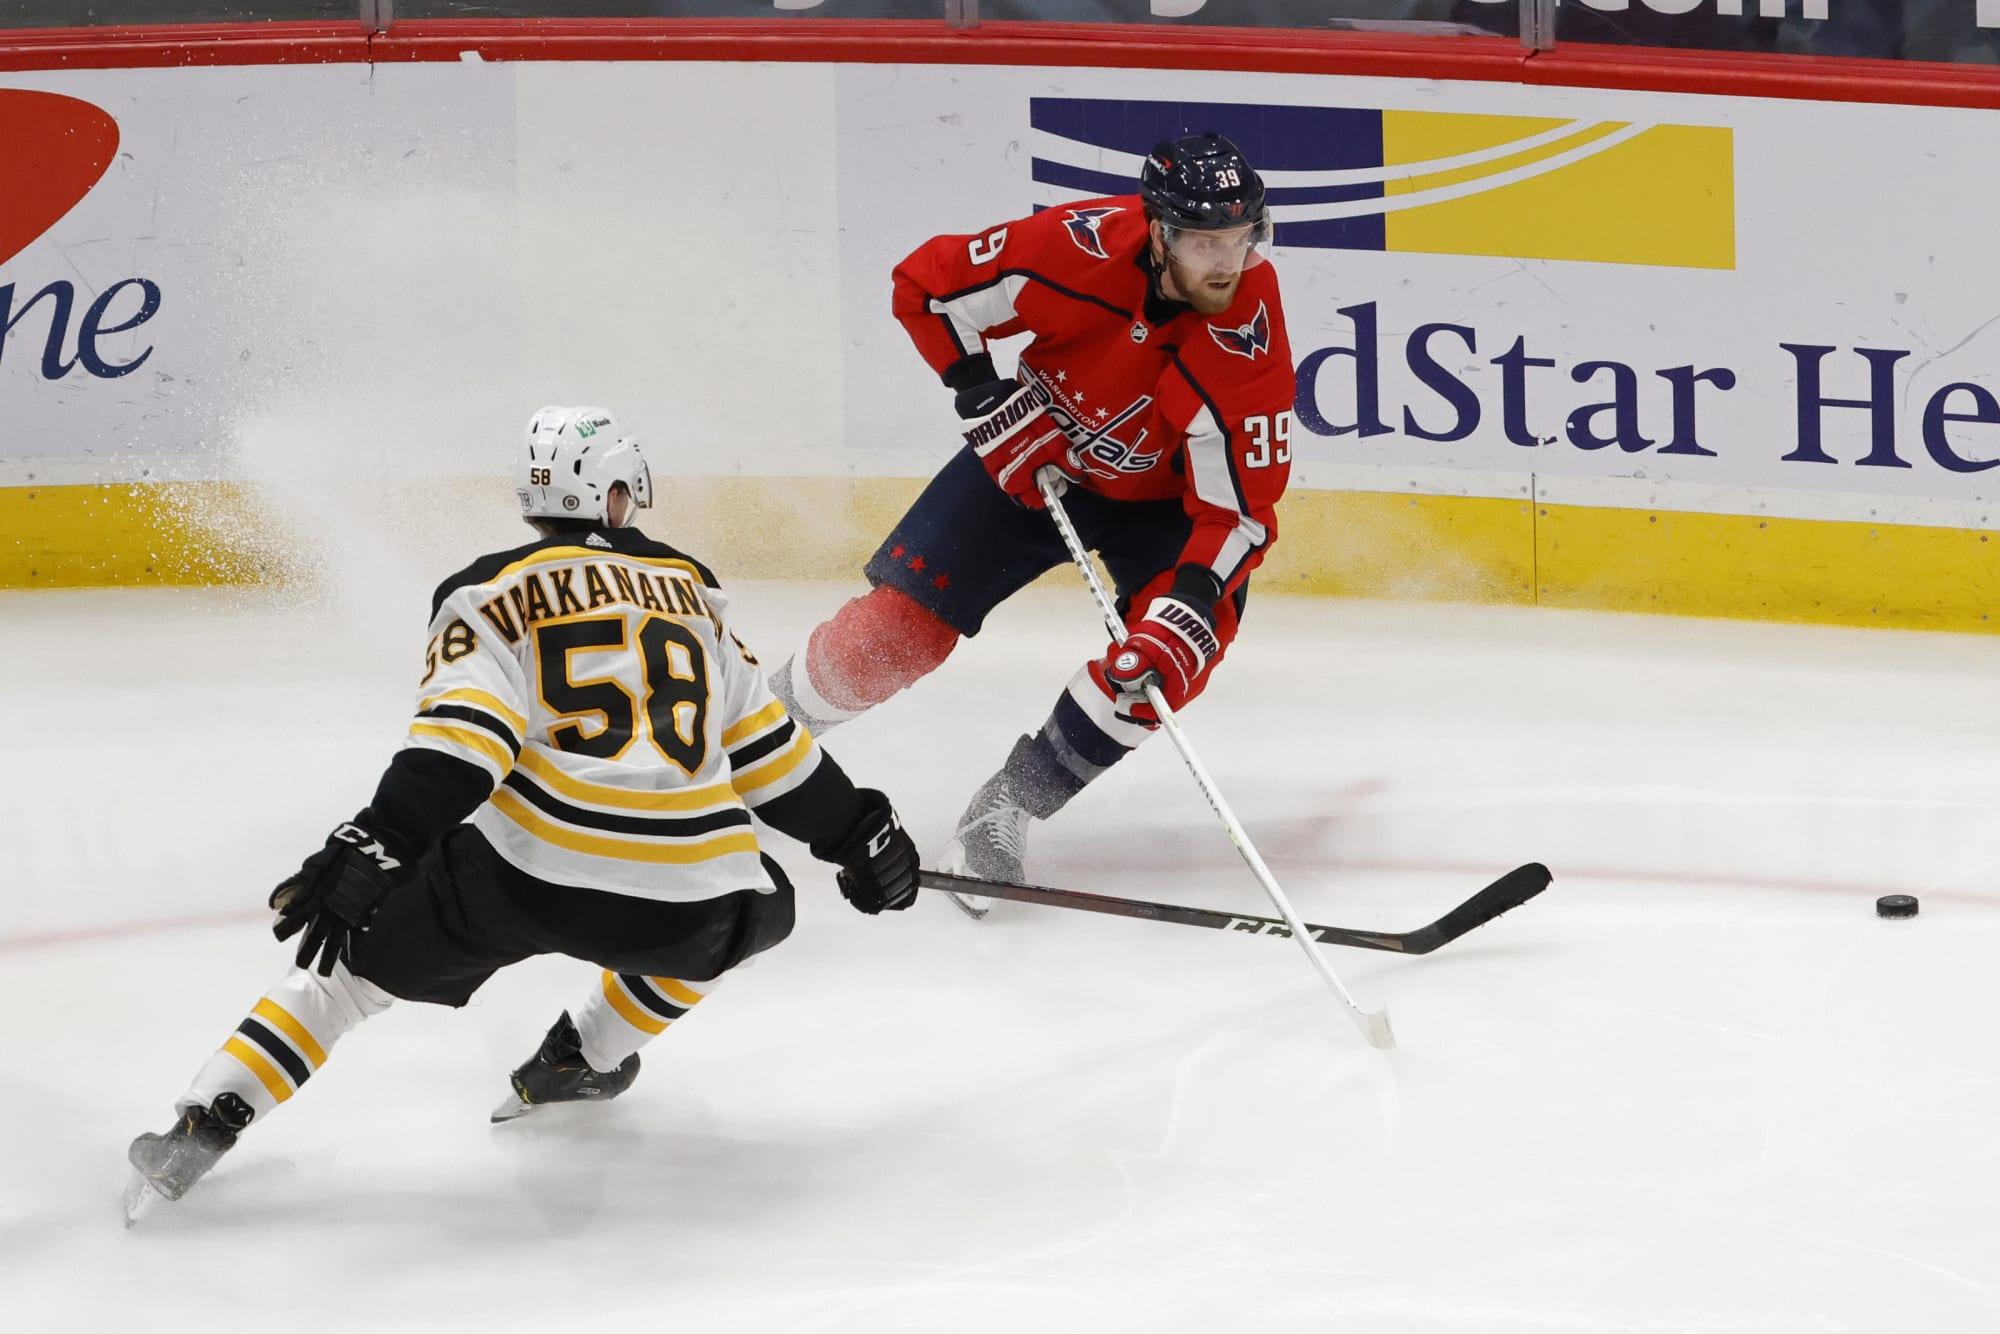 Boston Bruins: Will Urho Vaakanainen be in the NHL next season?